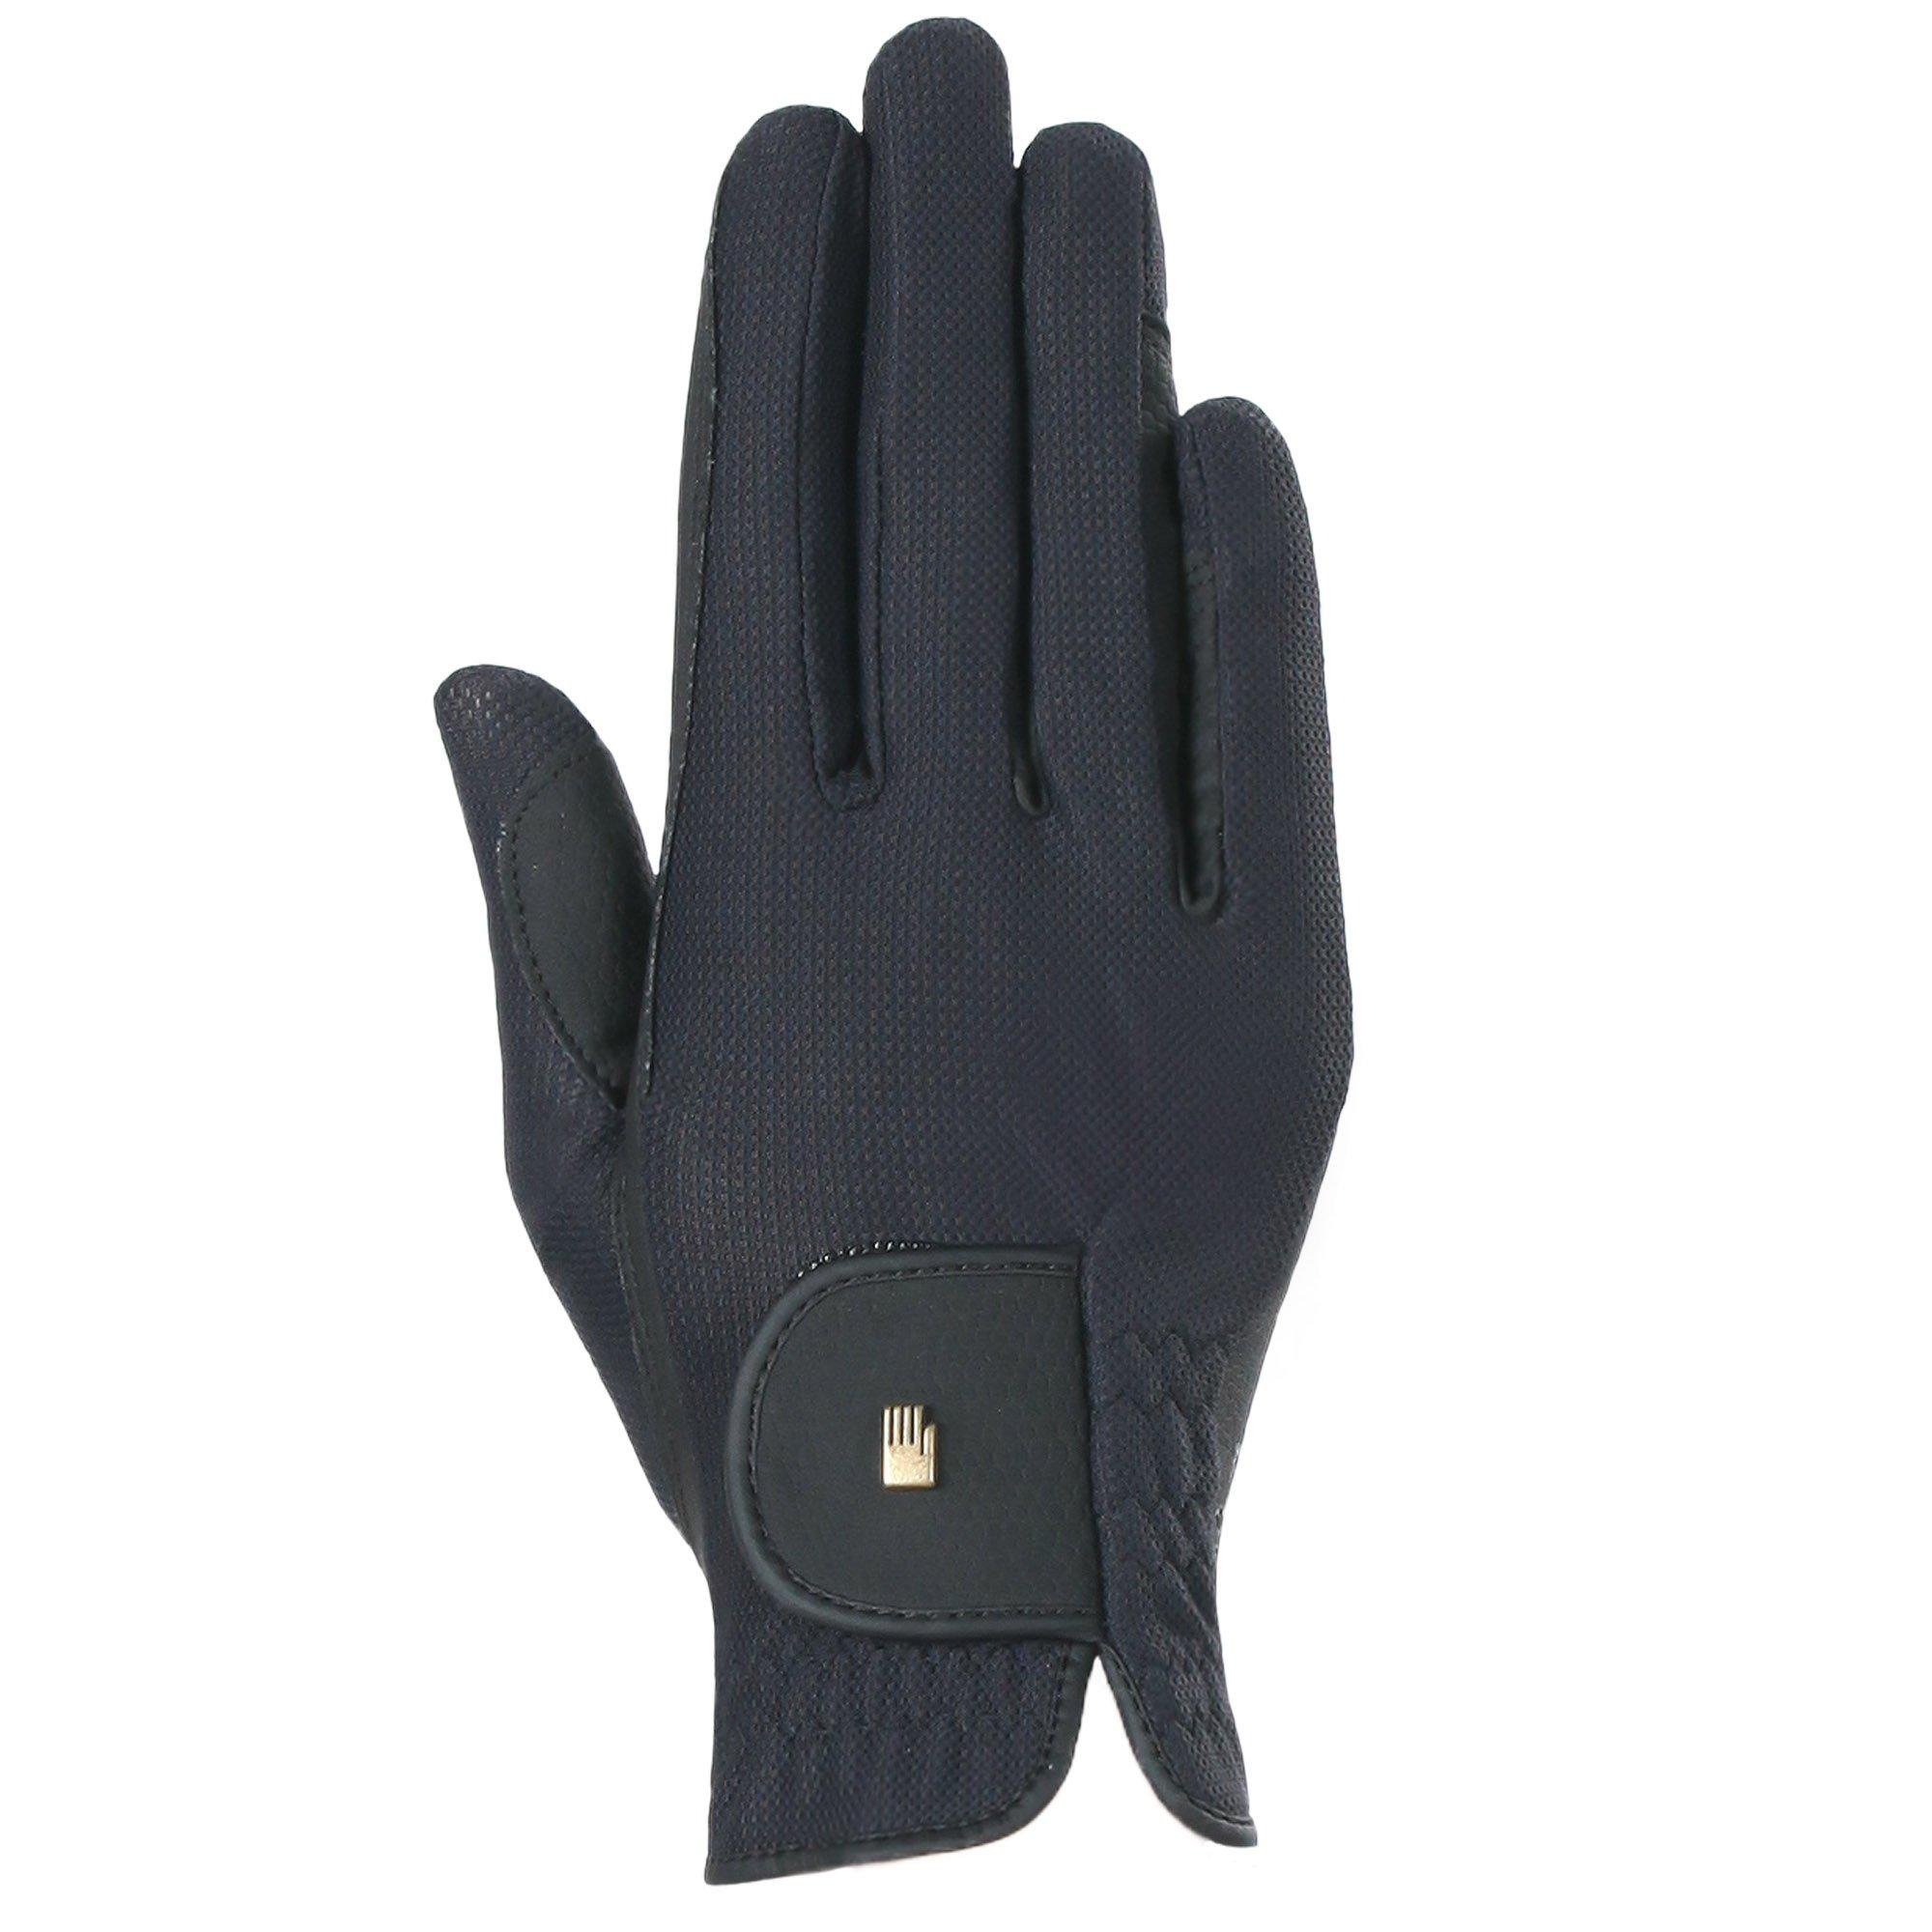 Roeckl Summer Chester Mesh Back Riding Glove (Black, 7.5)